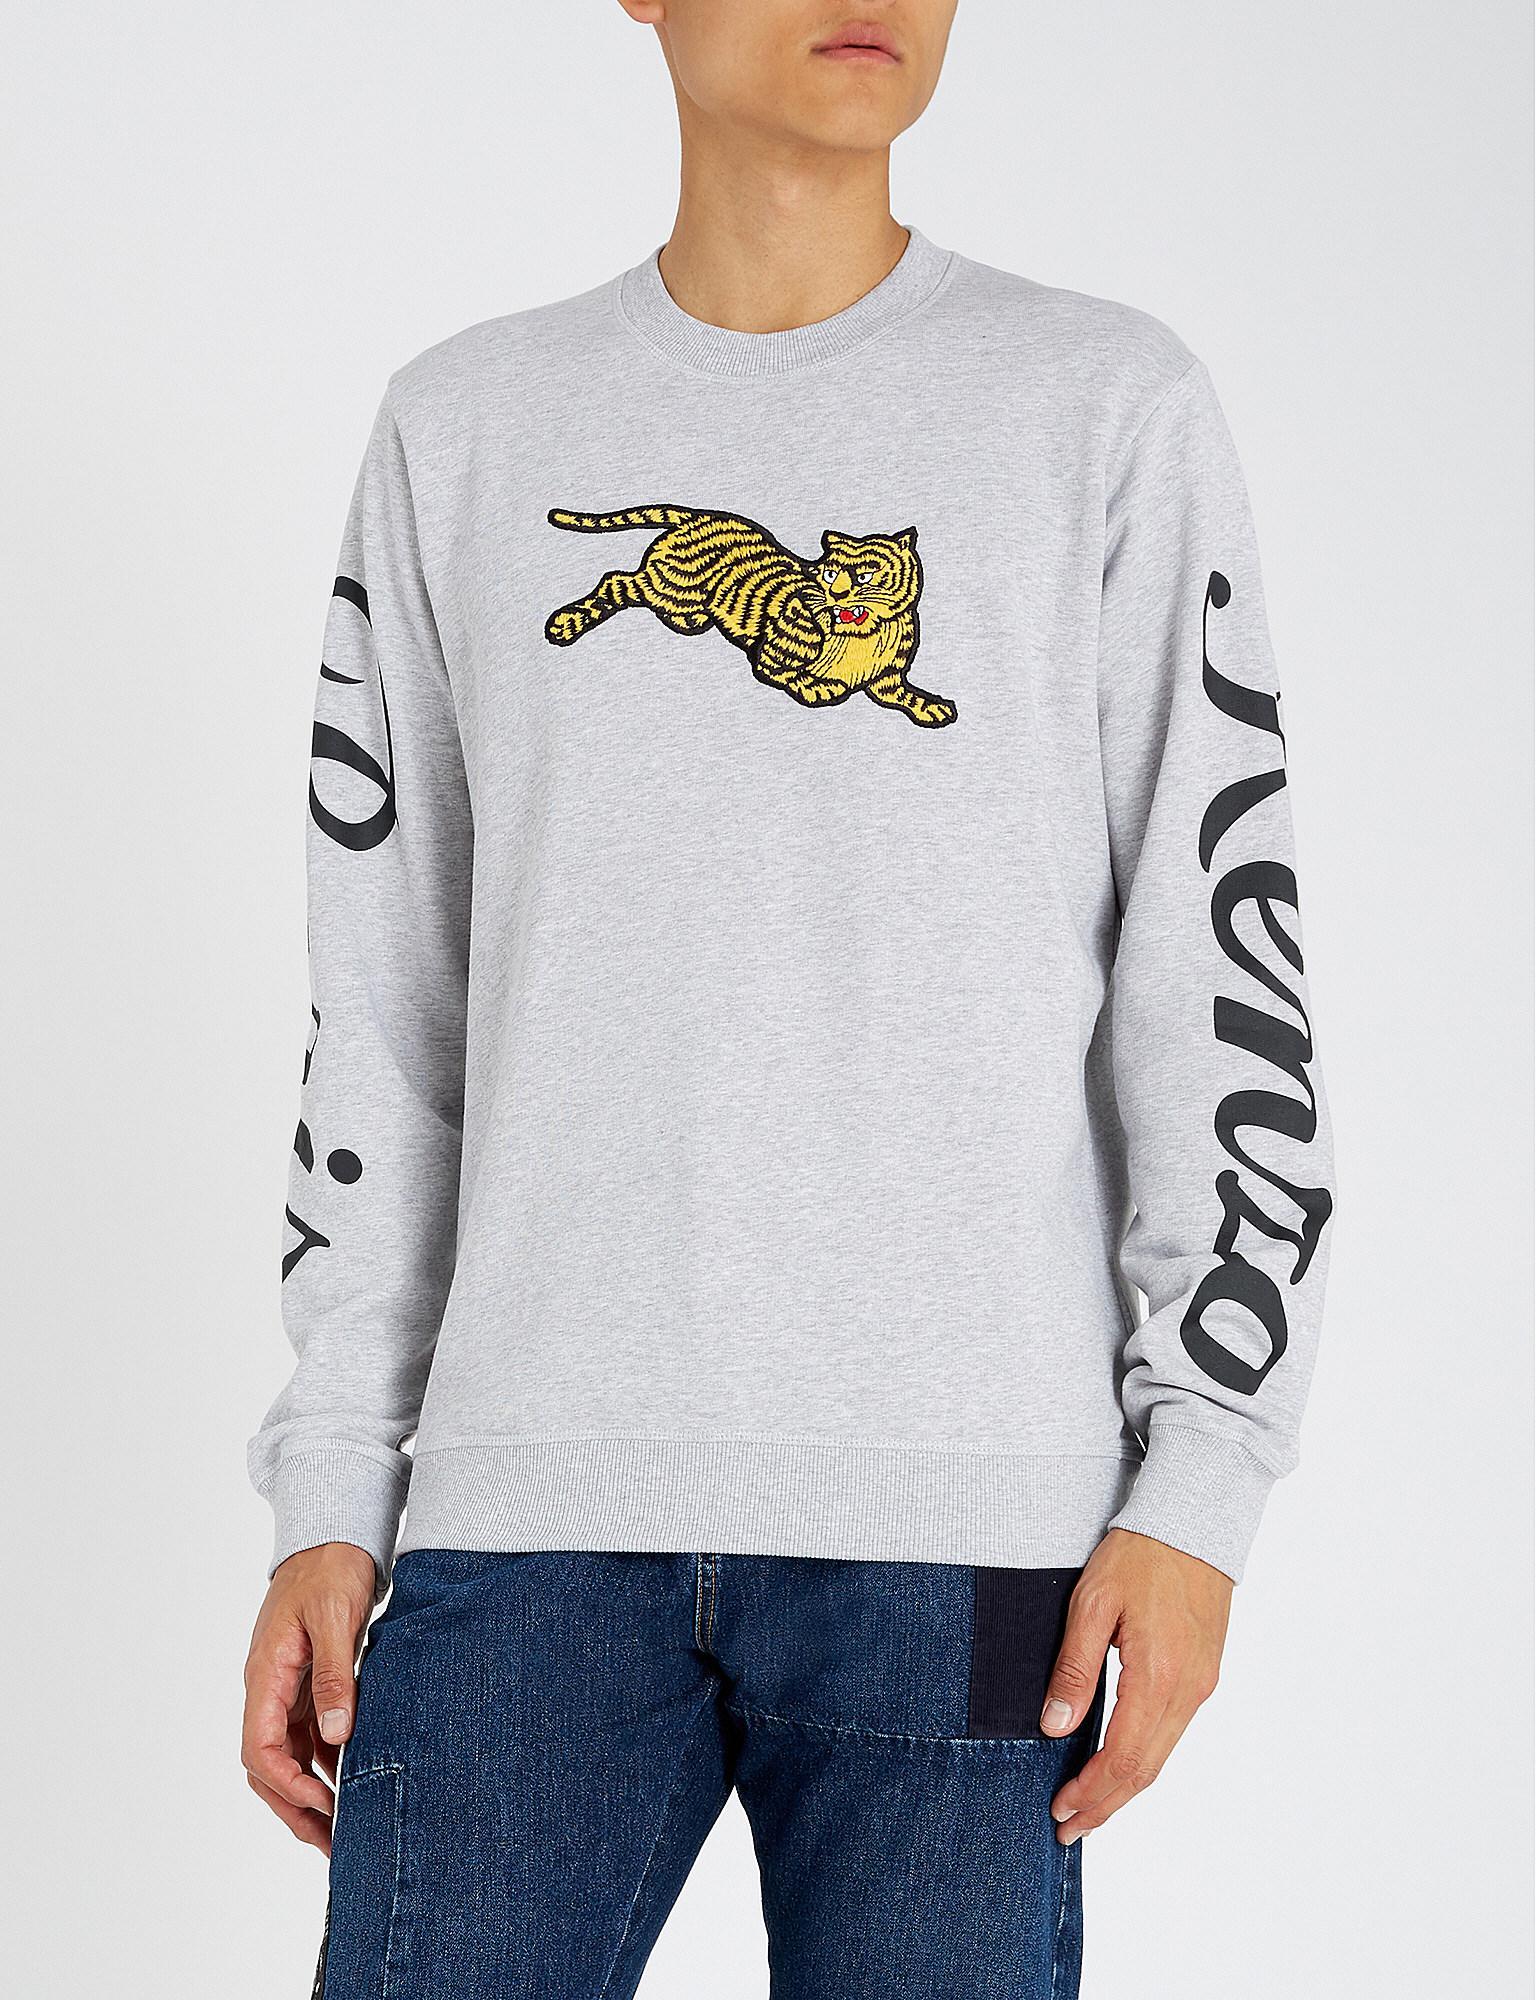 9b4d77ce7 Lyst - Kenzo Tiger-motif Cotton-jersey Sweatshirt in Gray for Men